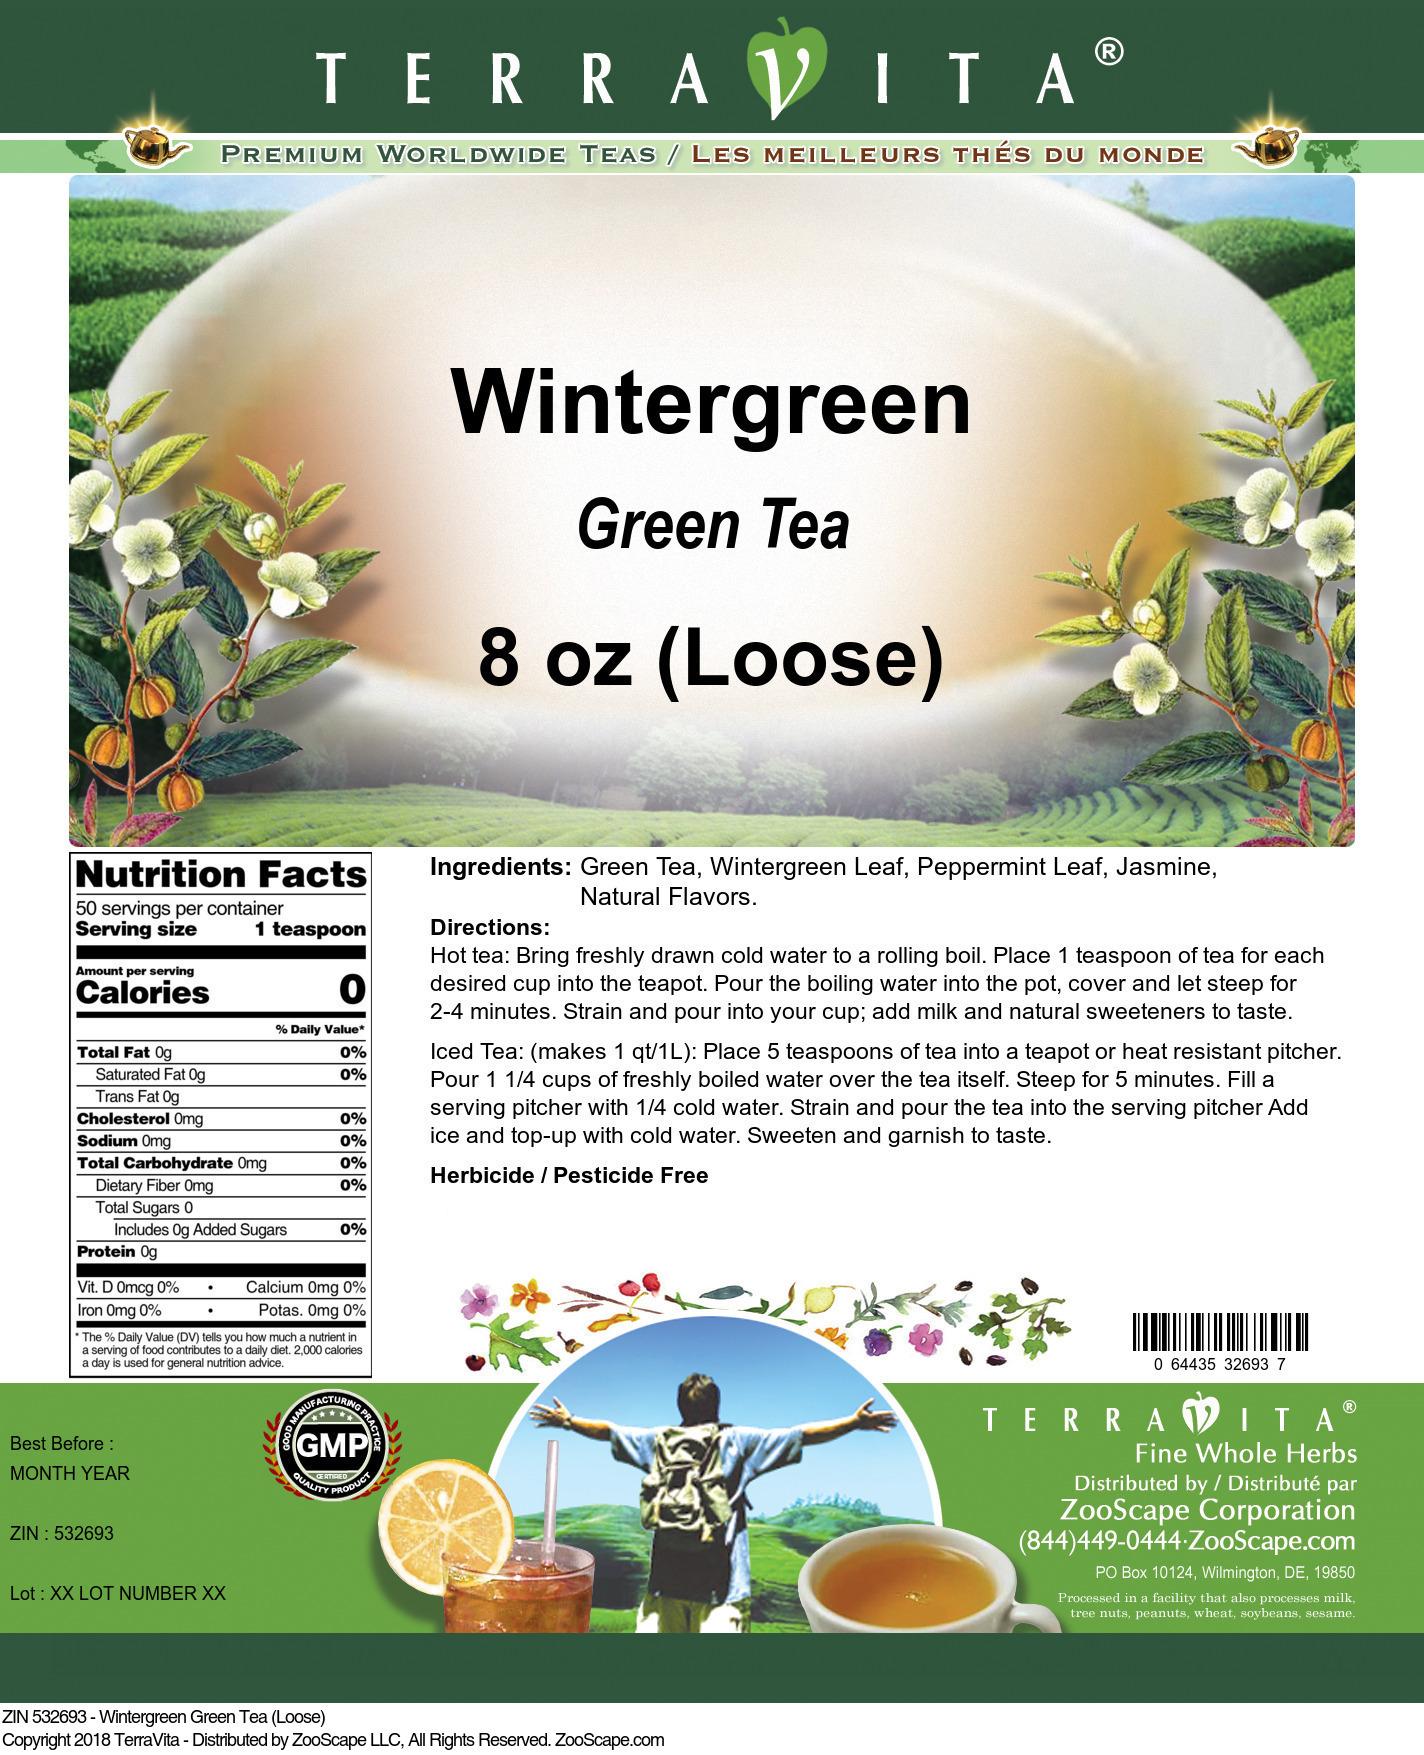 Wintergreen Green Tea (Loose)